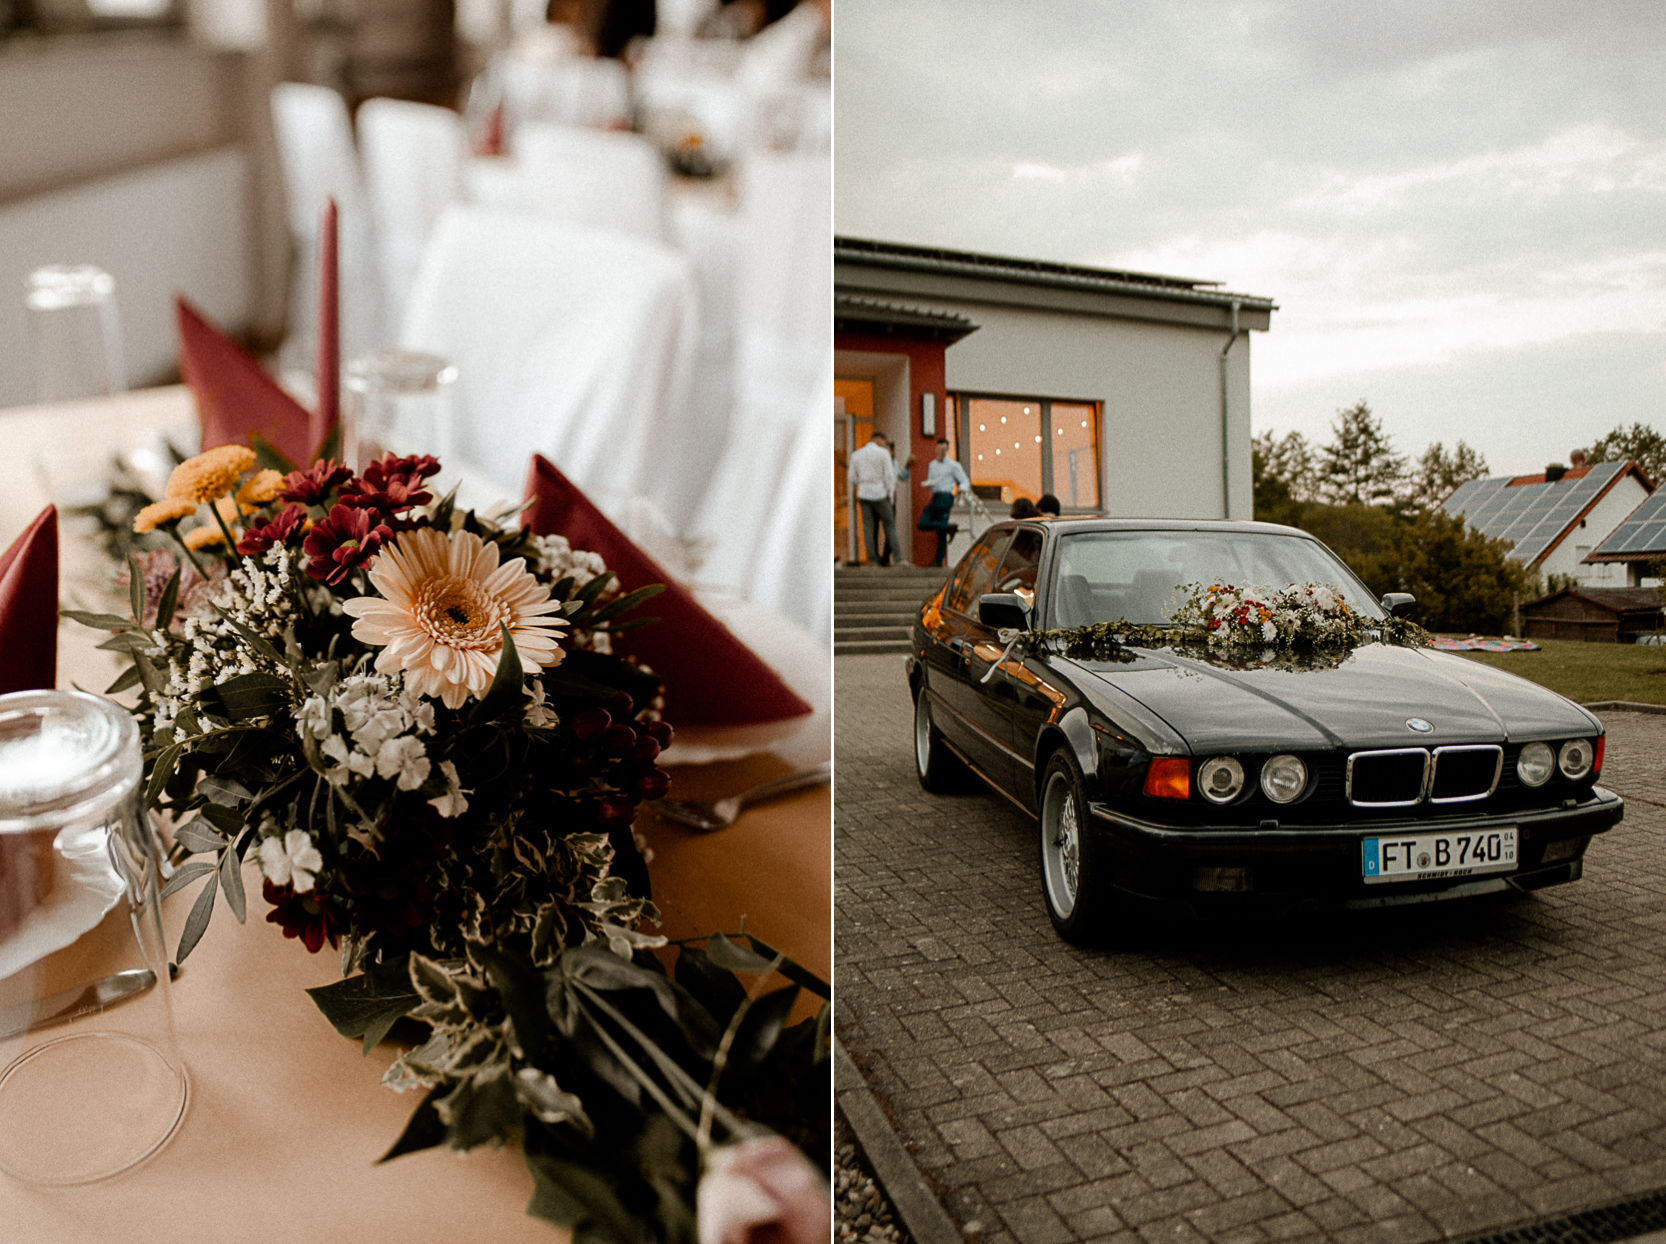 wholeheartedweddings-TimoMatthies-weddingphotography-moody-Melanie-Henrick-Mannheim-092.jpg